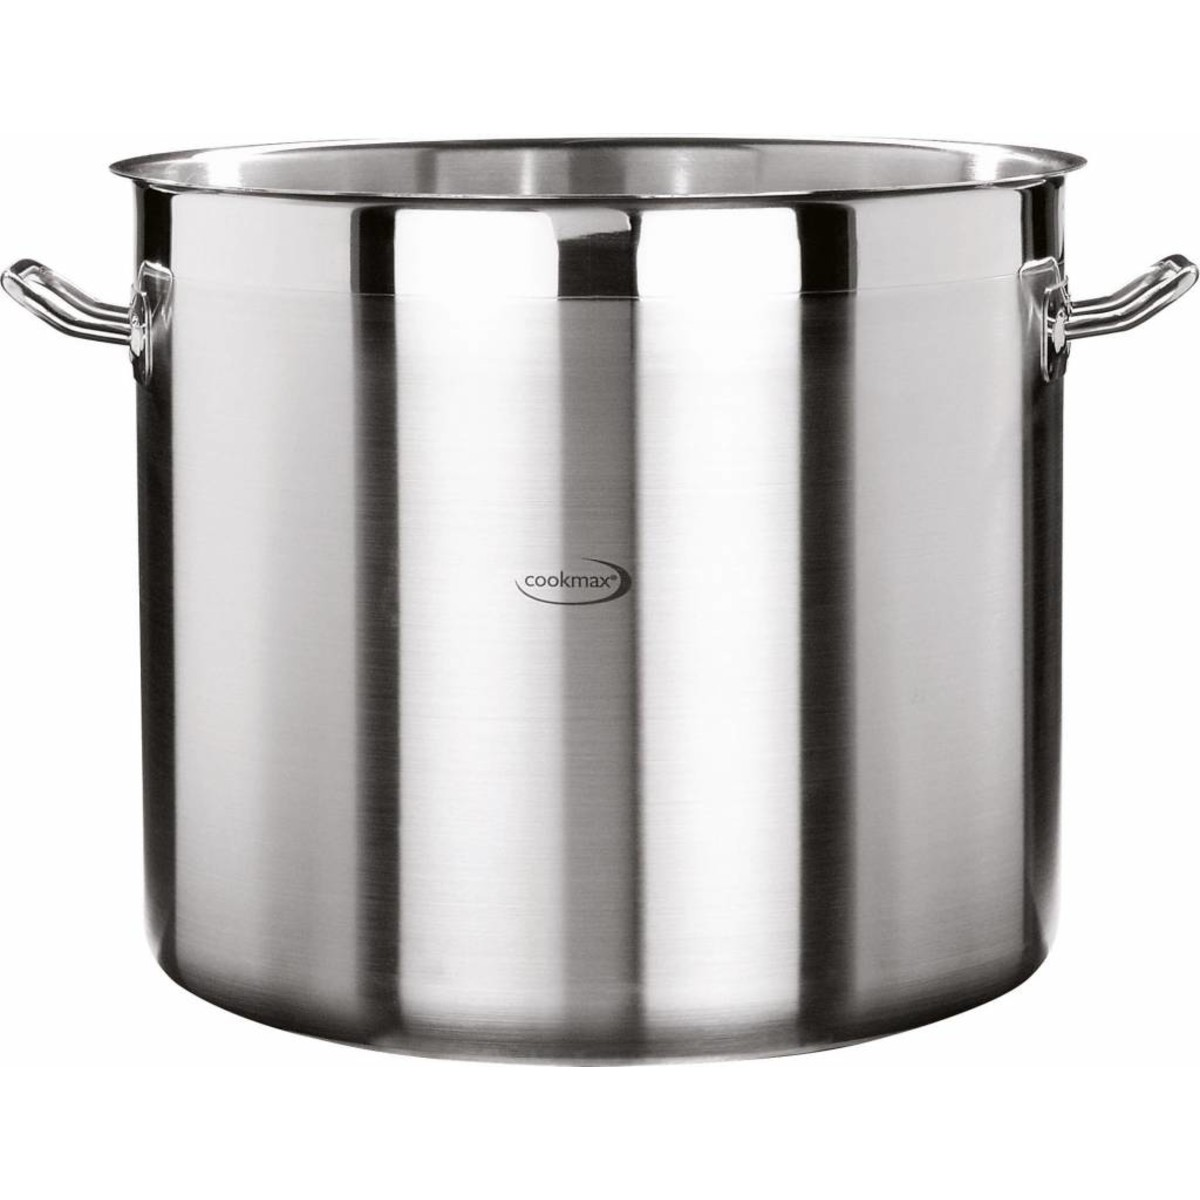 "Gemüse-/Suppenkessel ""Cookmax Professional"" Ø 40 cm, H: 40 cm. Inhalt 50L"